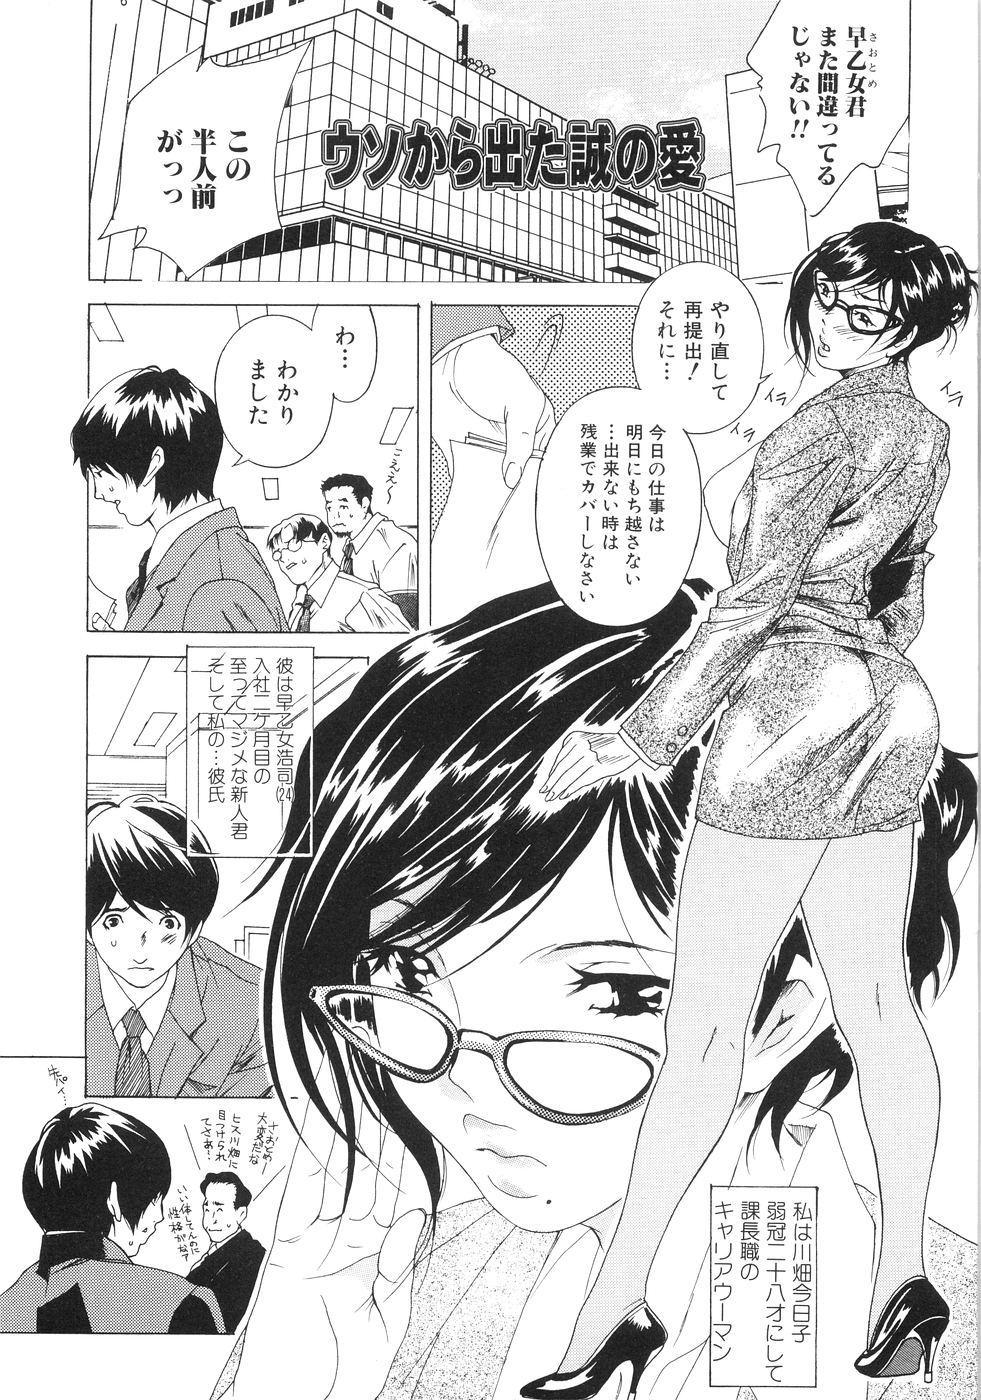 Honki Jiru - Cowper's Gland Liquid? or Love Juice?...?! 39